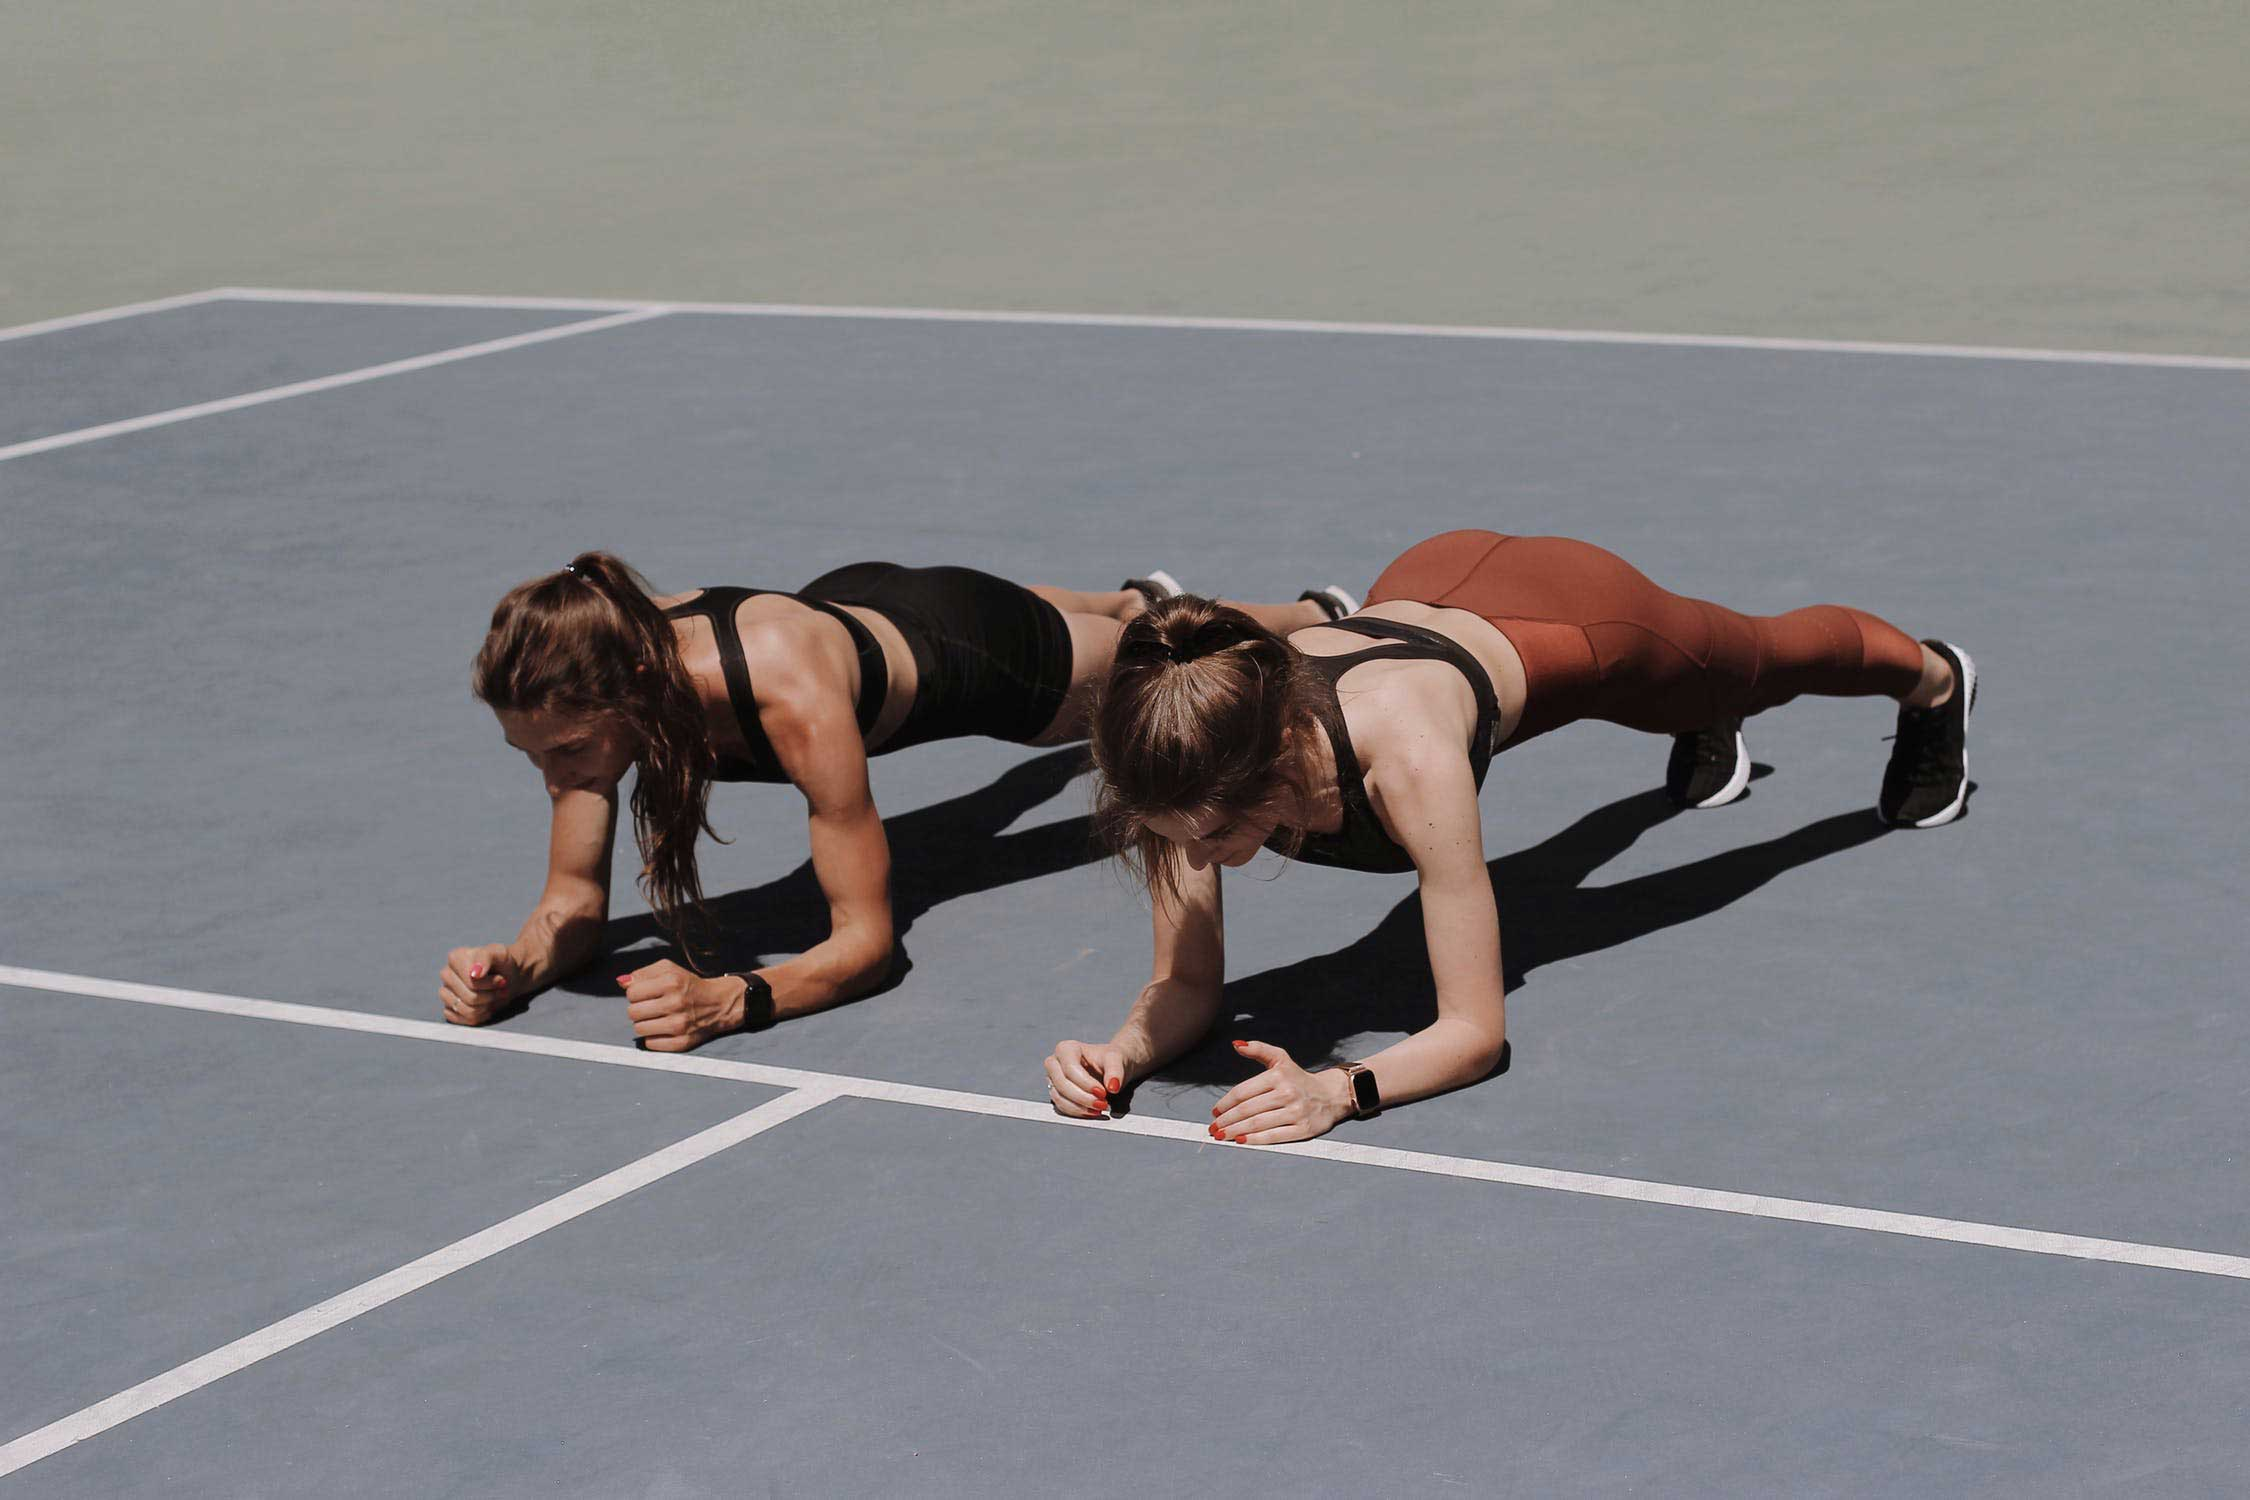 5 Jenis Olahraga untuk Mengecilkan Lengan Bergelambir